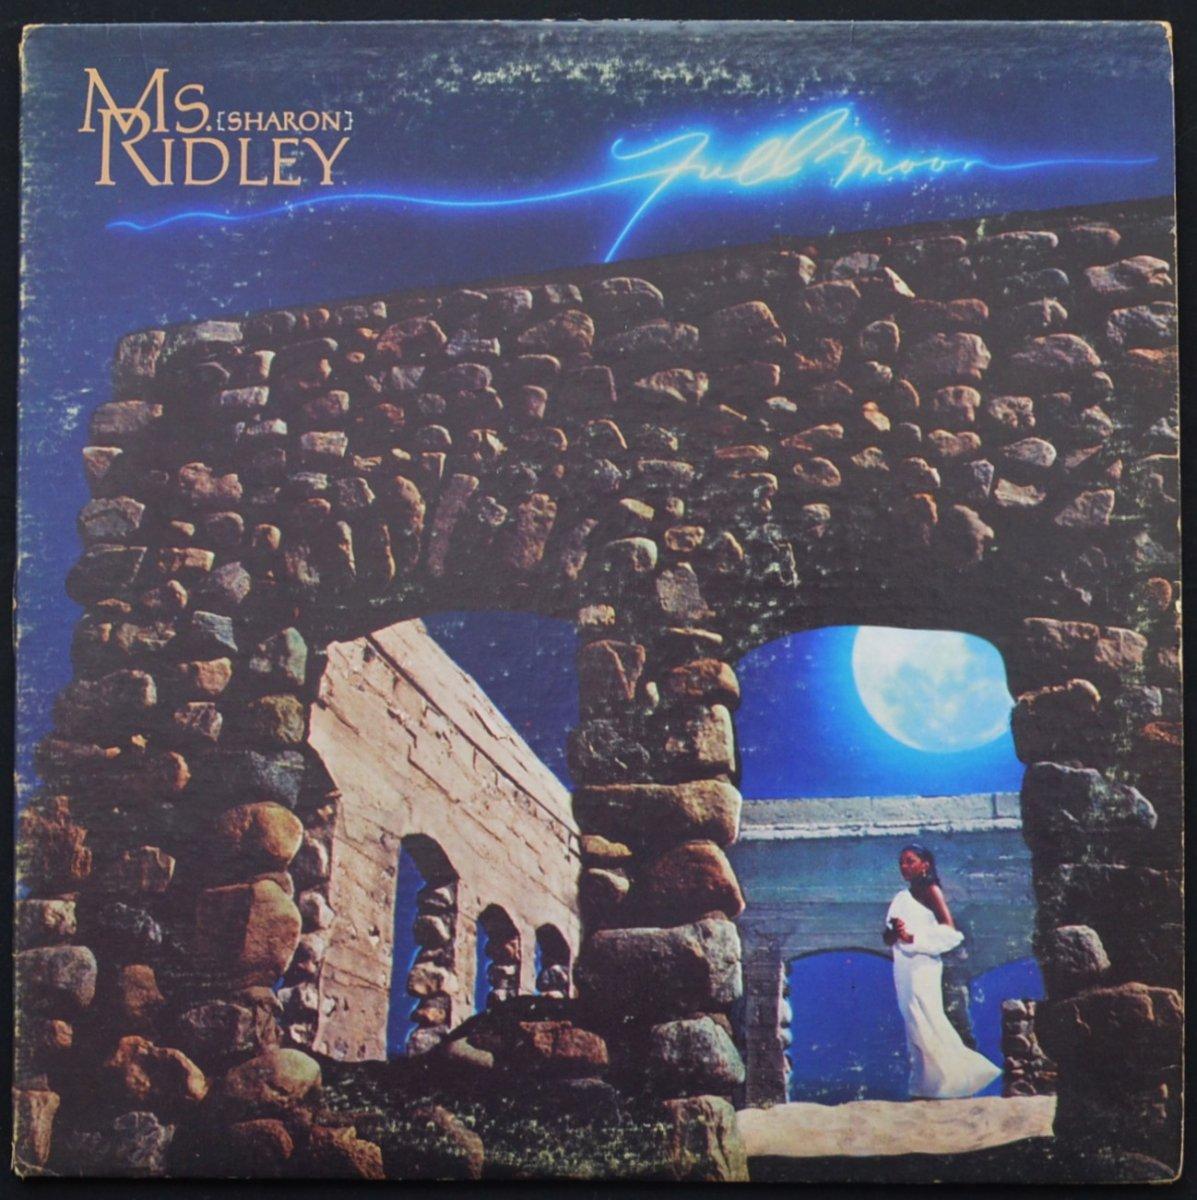 MS. (SHARON) RIDLEY / FULL MOON (LP)